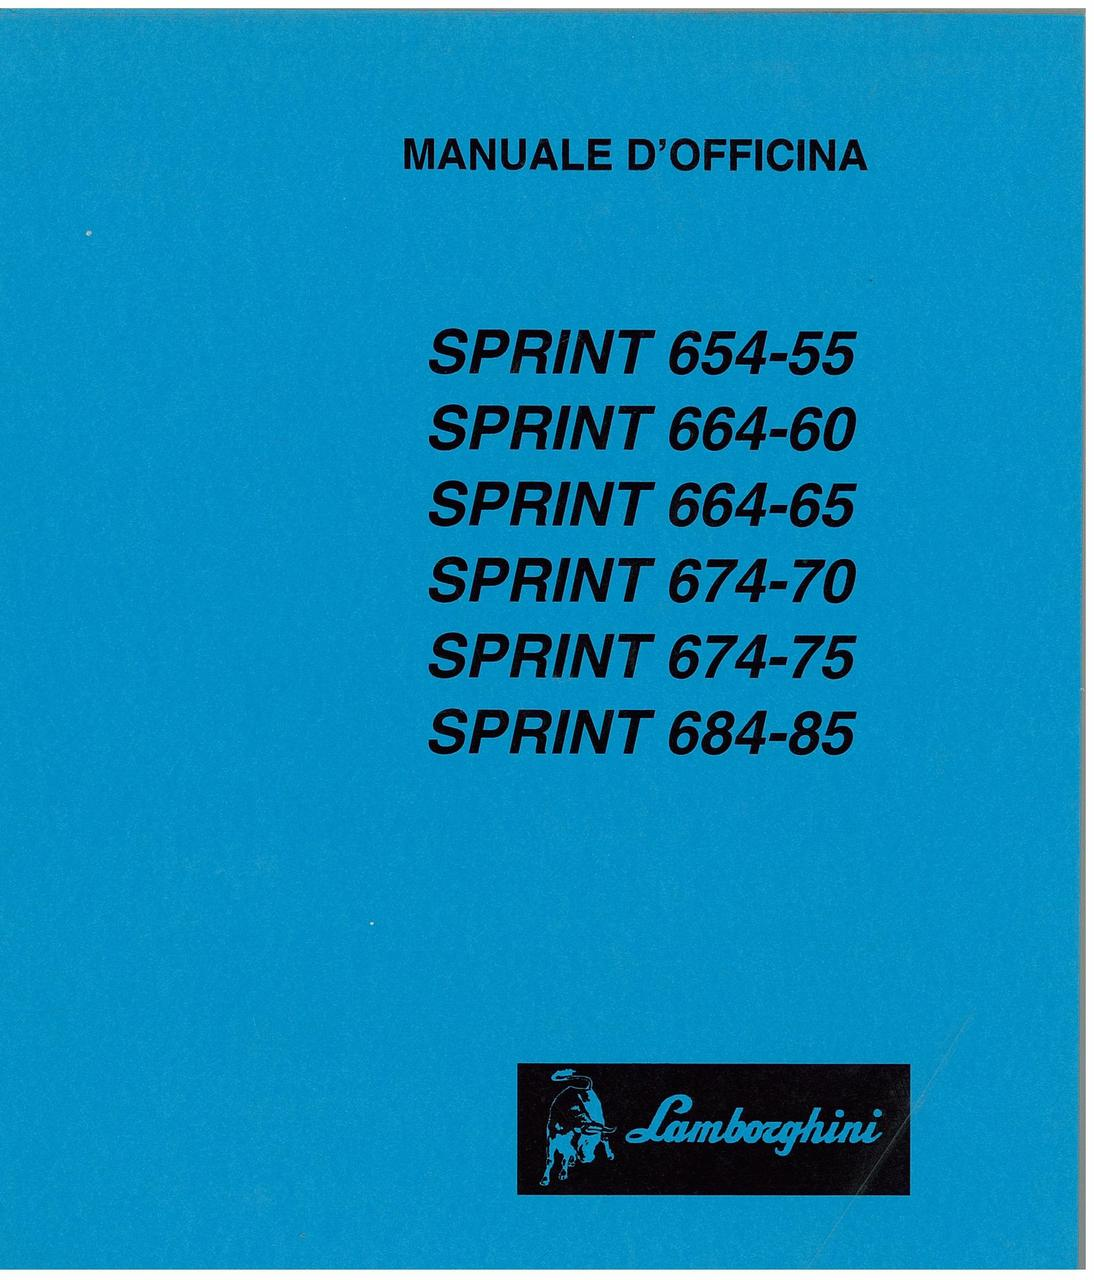 SPRINT 654.55 - 664.60 - 664.65 - 674.70 - 674.75 - 684.85 - Manuale d'Officina